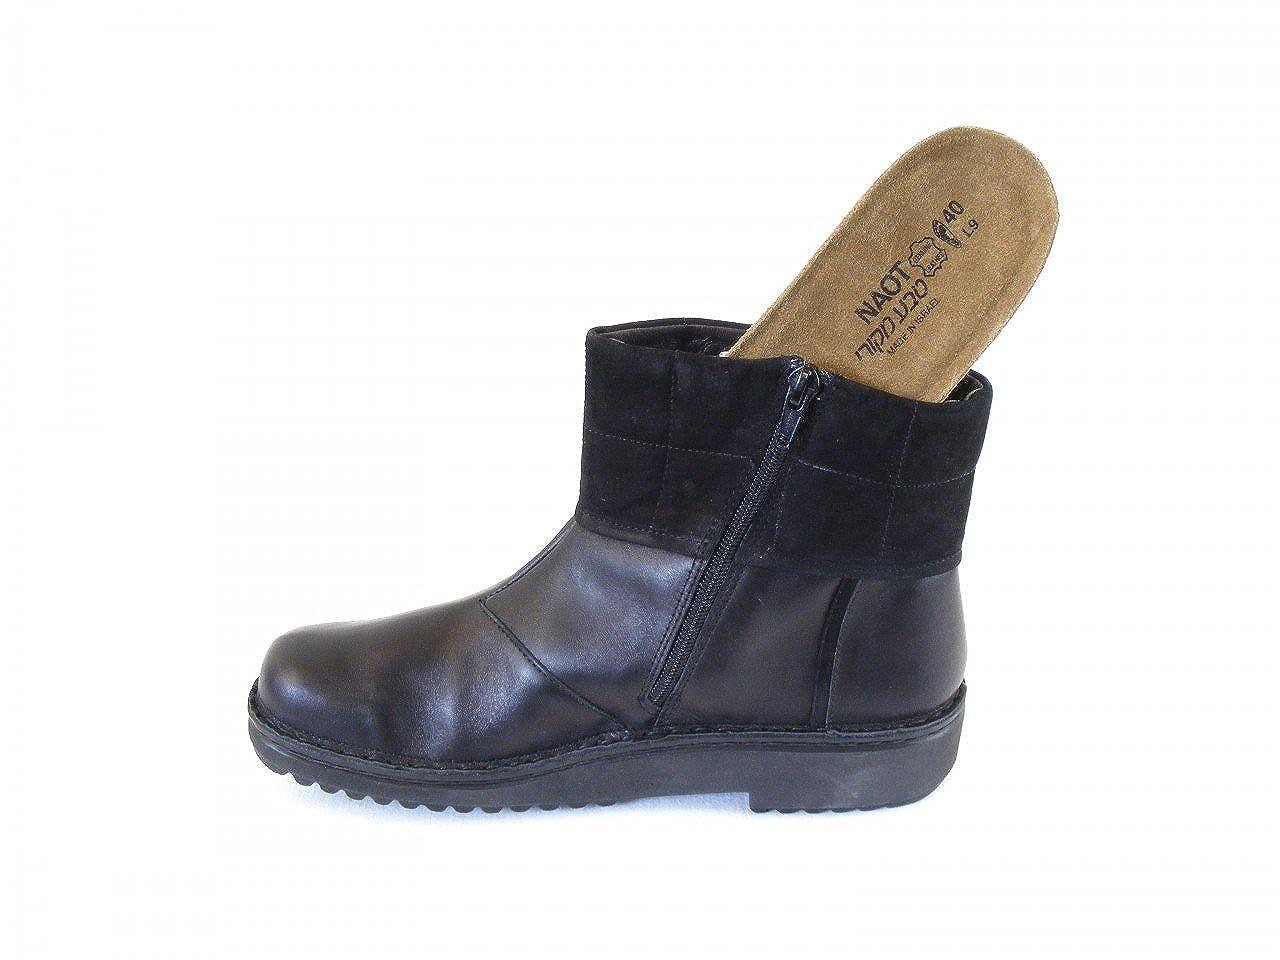 Naot Damen Schuhe Stiefeletten Leder Leder Stiefeletten Kristin schwarz 8944 Wechselfußbett Kork - 91f902